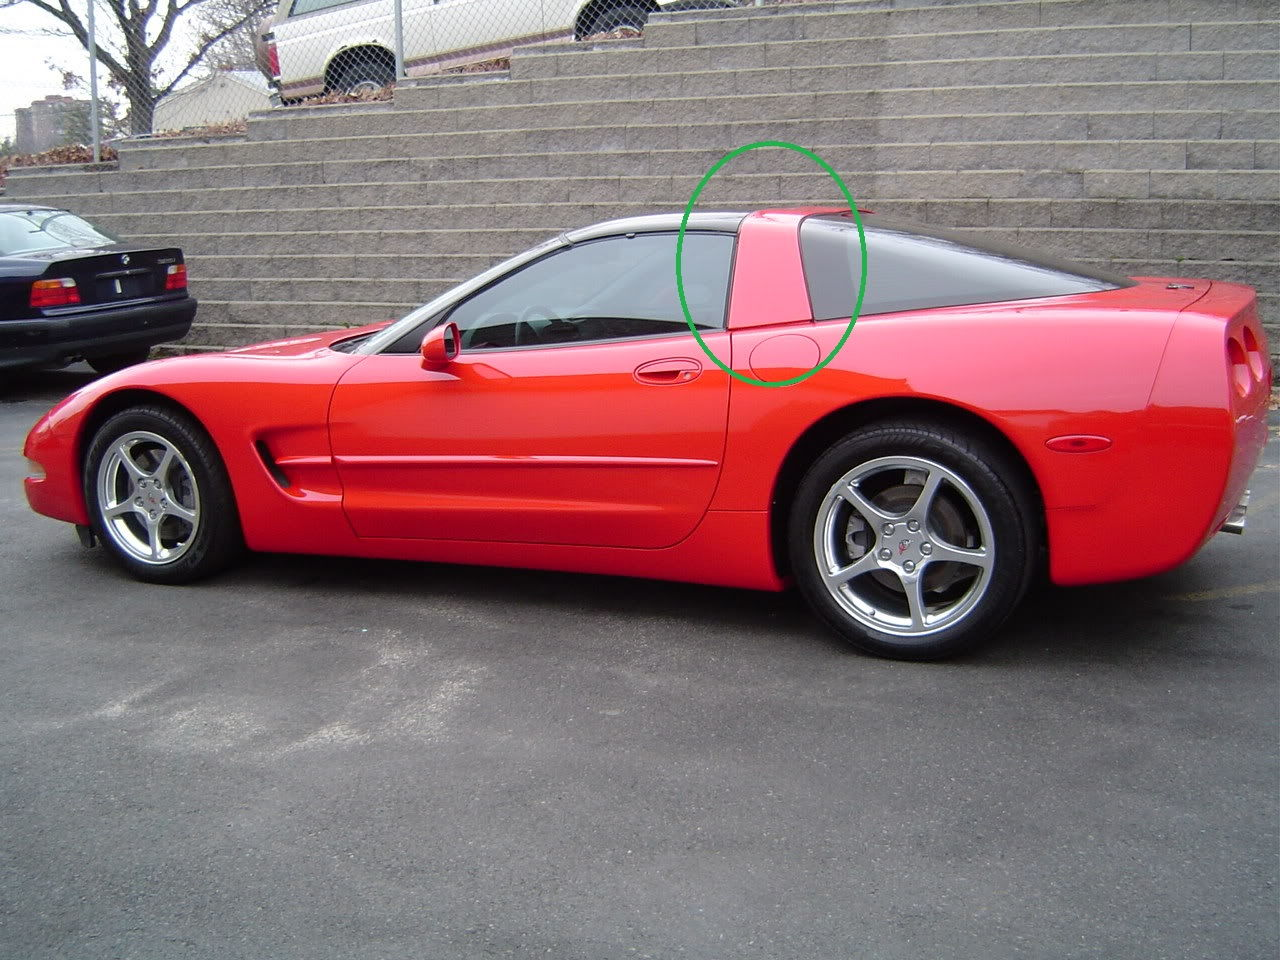 Red Corvette C6 >> 3M vinyl wrapped halo issues - CorvetteForum - Chevrolet Corvette Forum Discussion